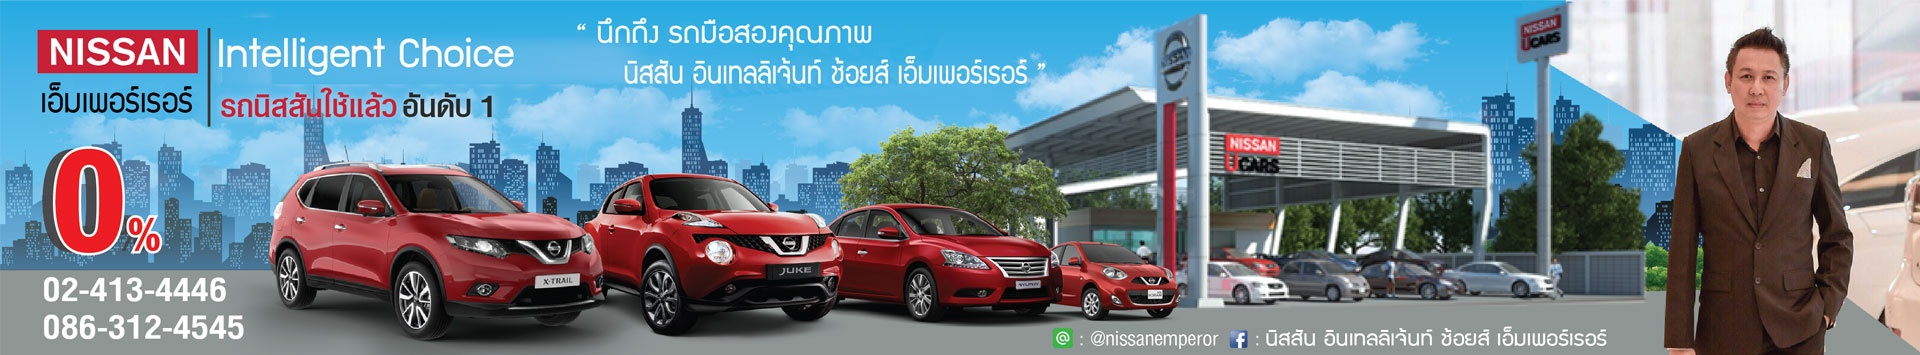 NissanIntelligent-Technology-Strip-Content2